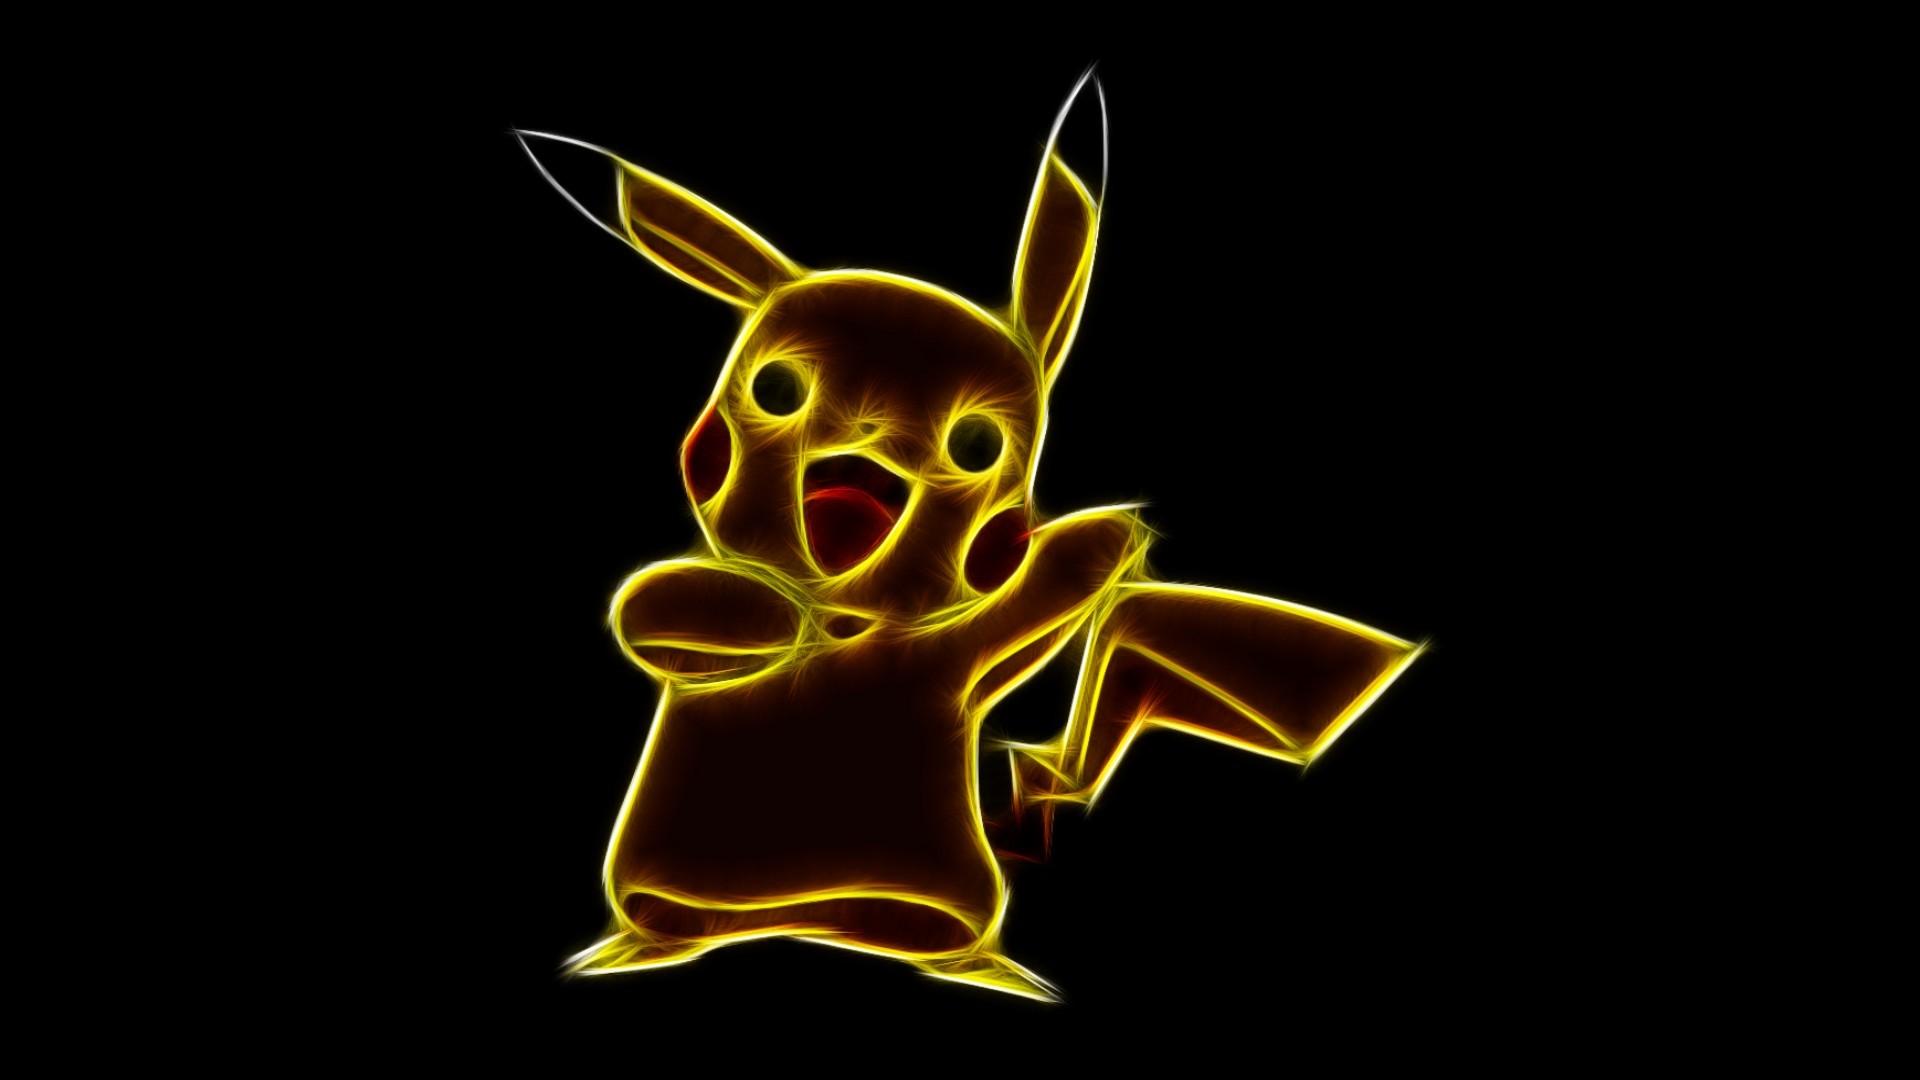 pikachu wallpaper 64919